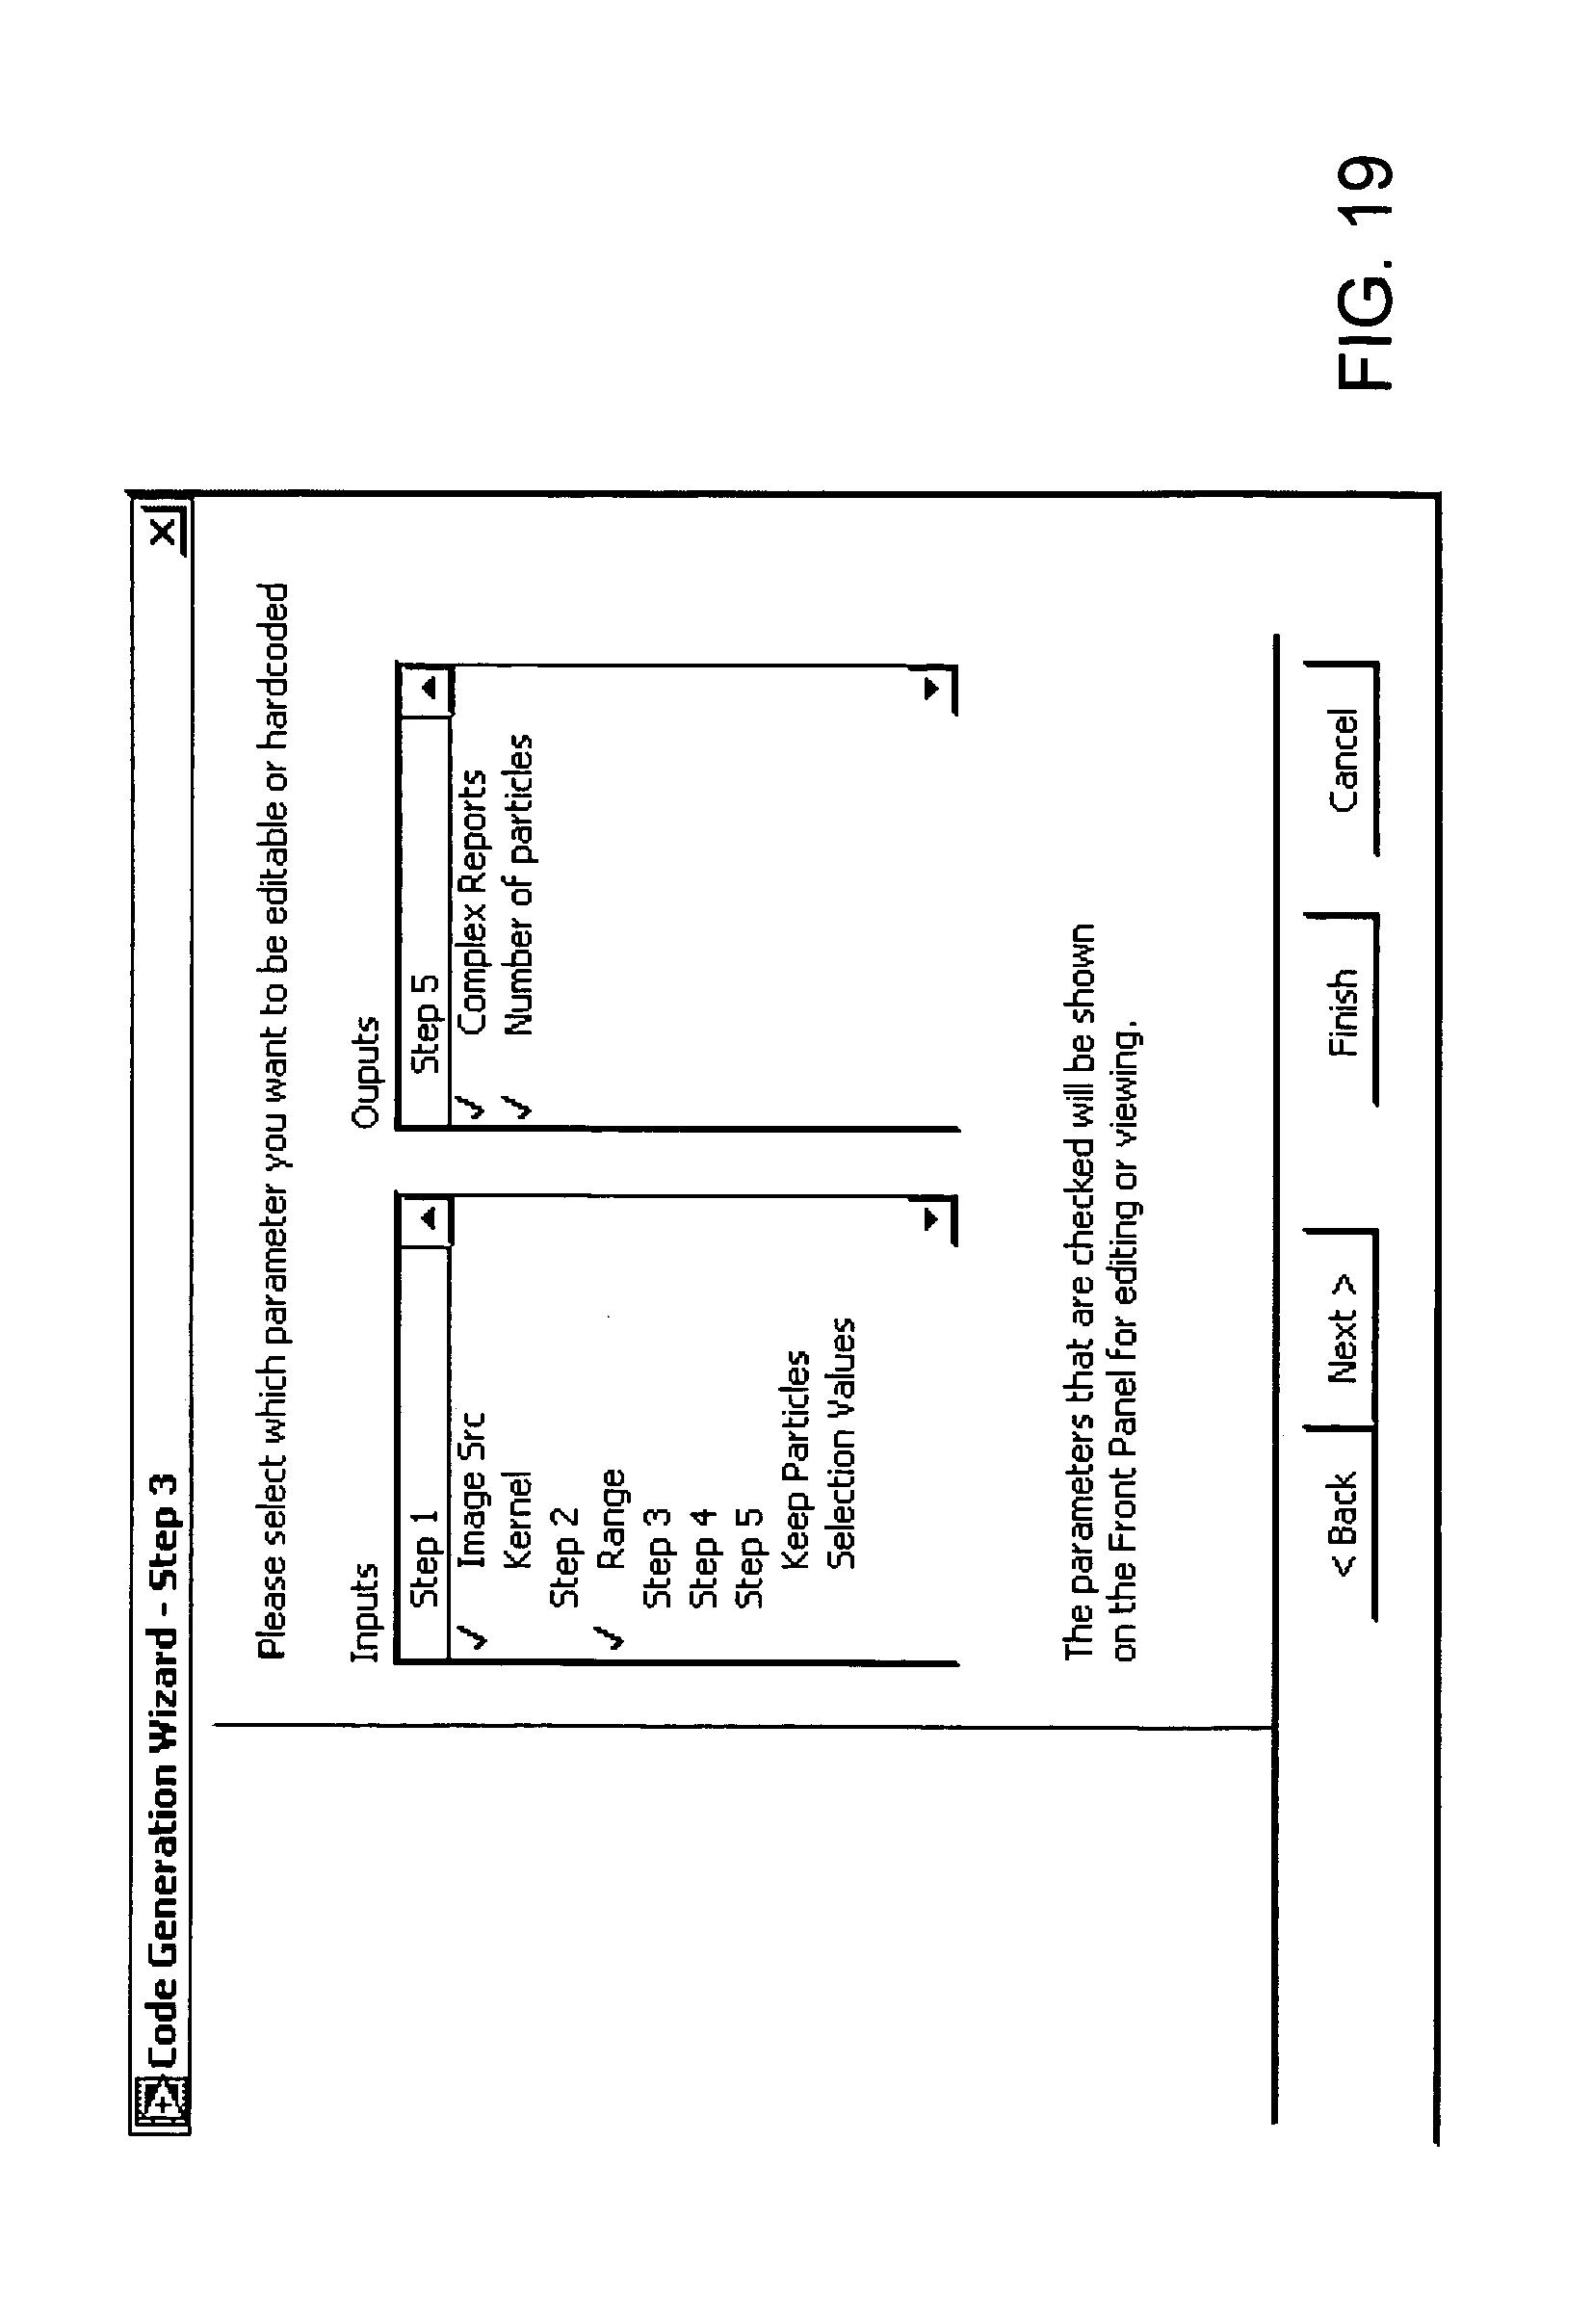 implementation of image processing algorithms on Efficient implementation of image processing algorithms on linear processor arrays using the data parallel language idc shorin kyo, kan sato mva.